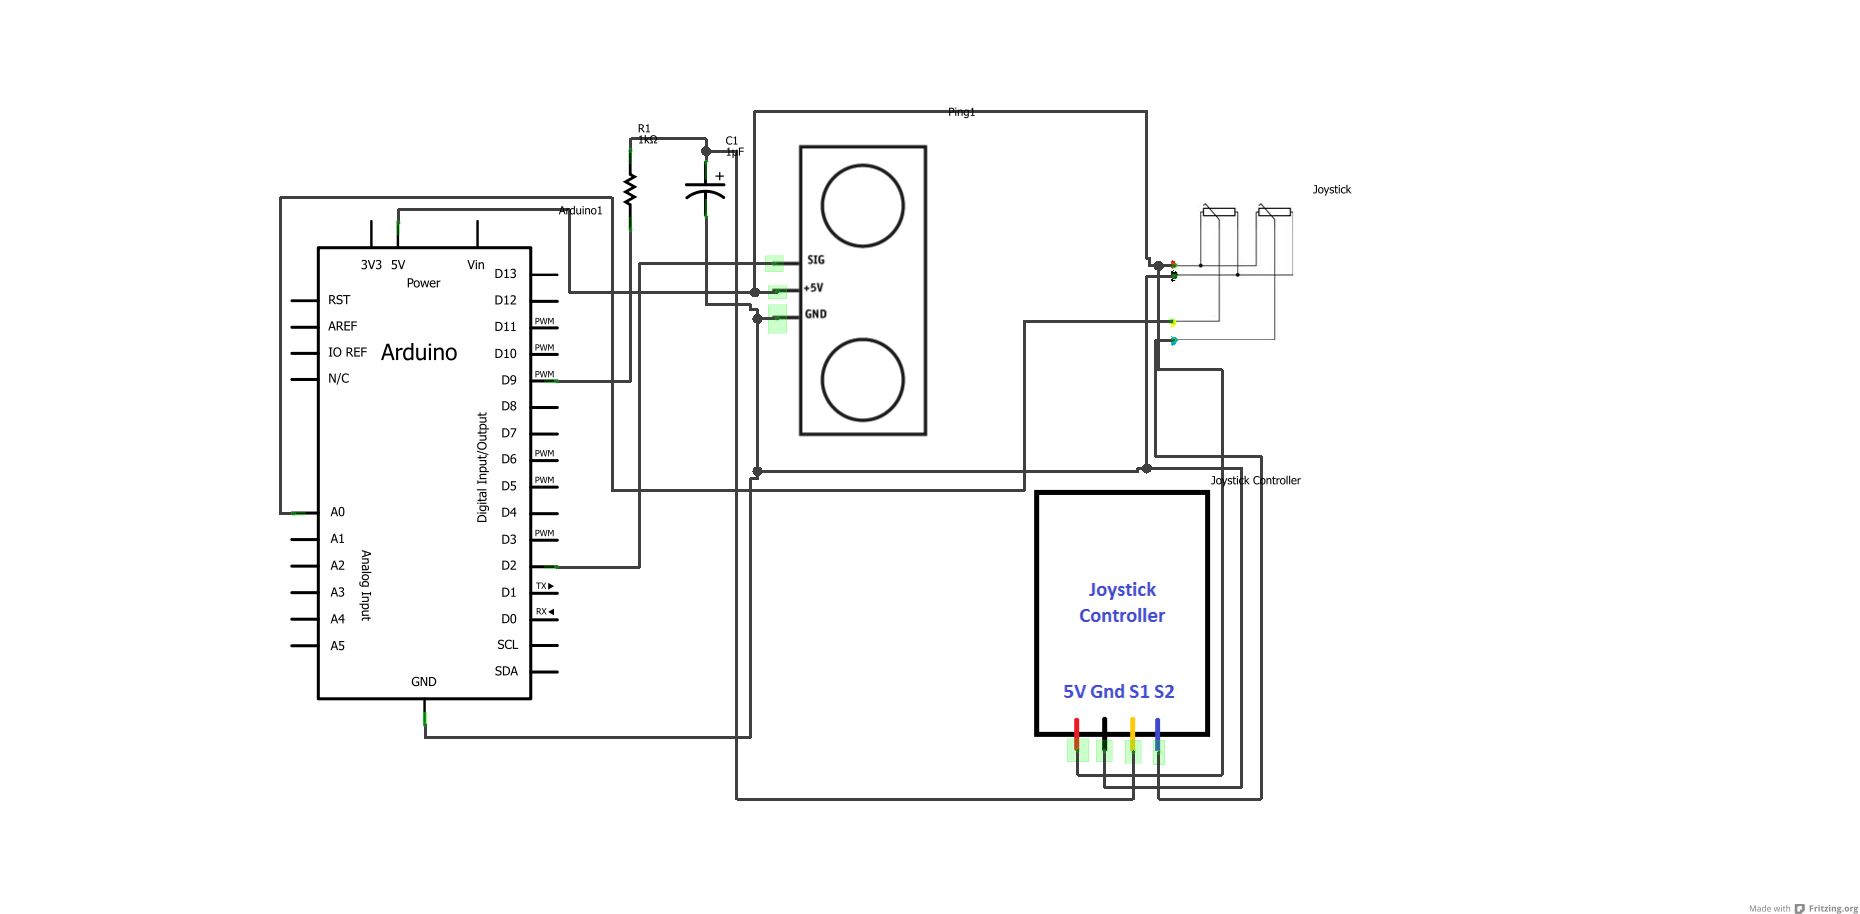 u0026gt  light laser led  u0026gt  led circuits  u0026gt  light emitting diode circuit of the temperature control